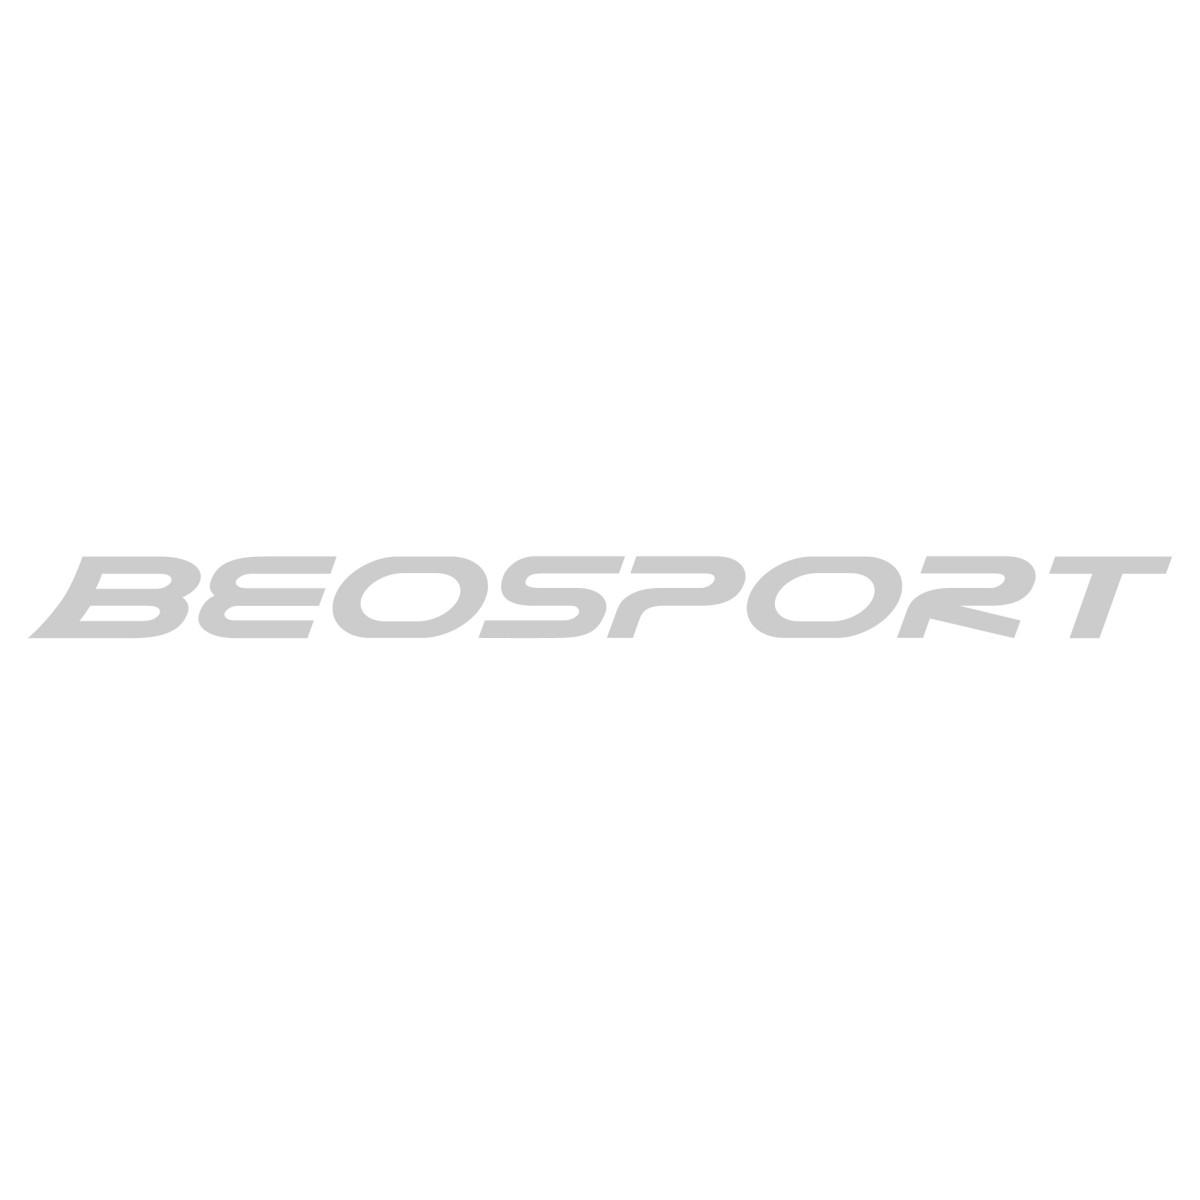 Garcia Men's košulja